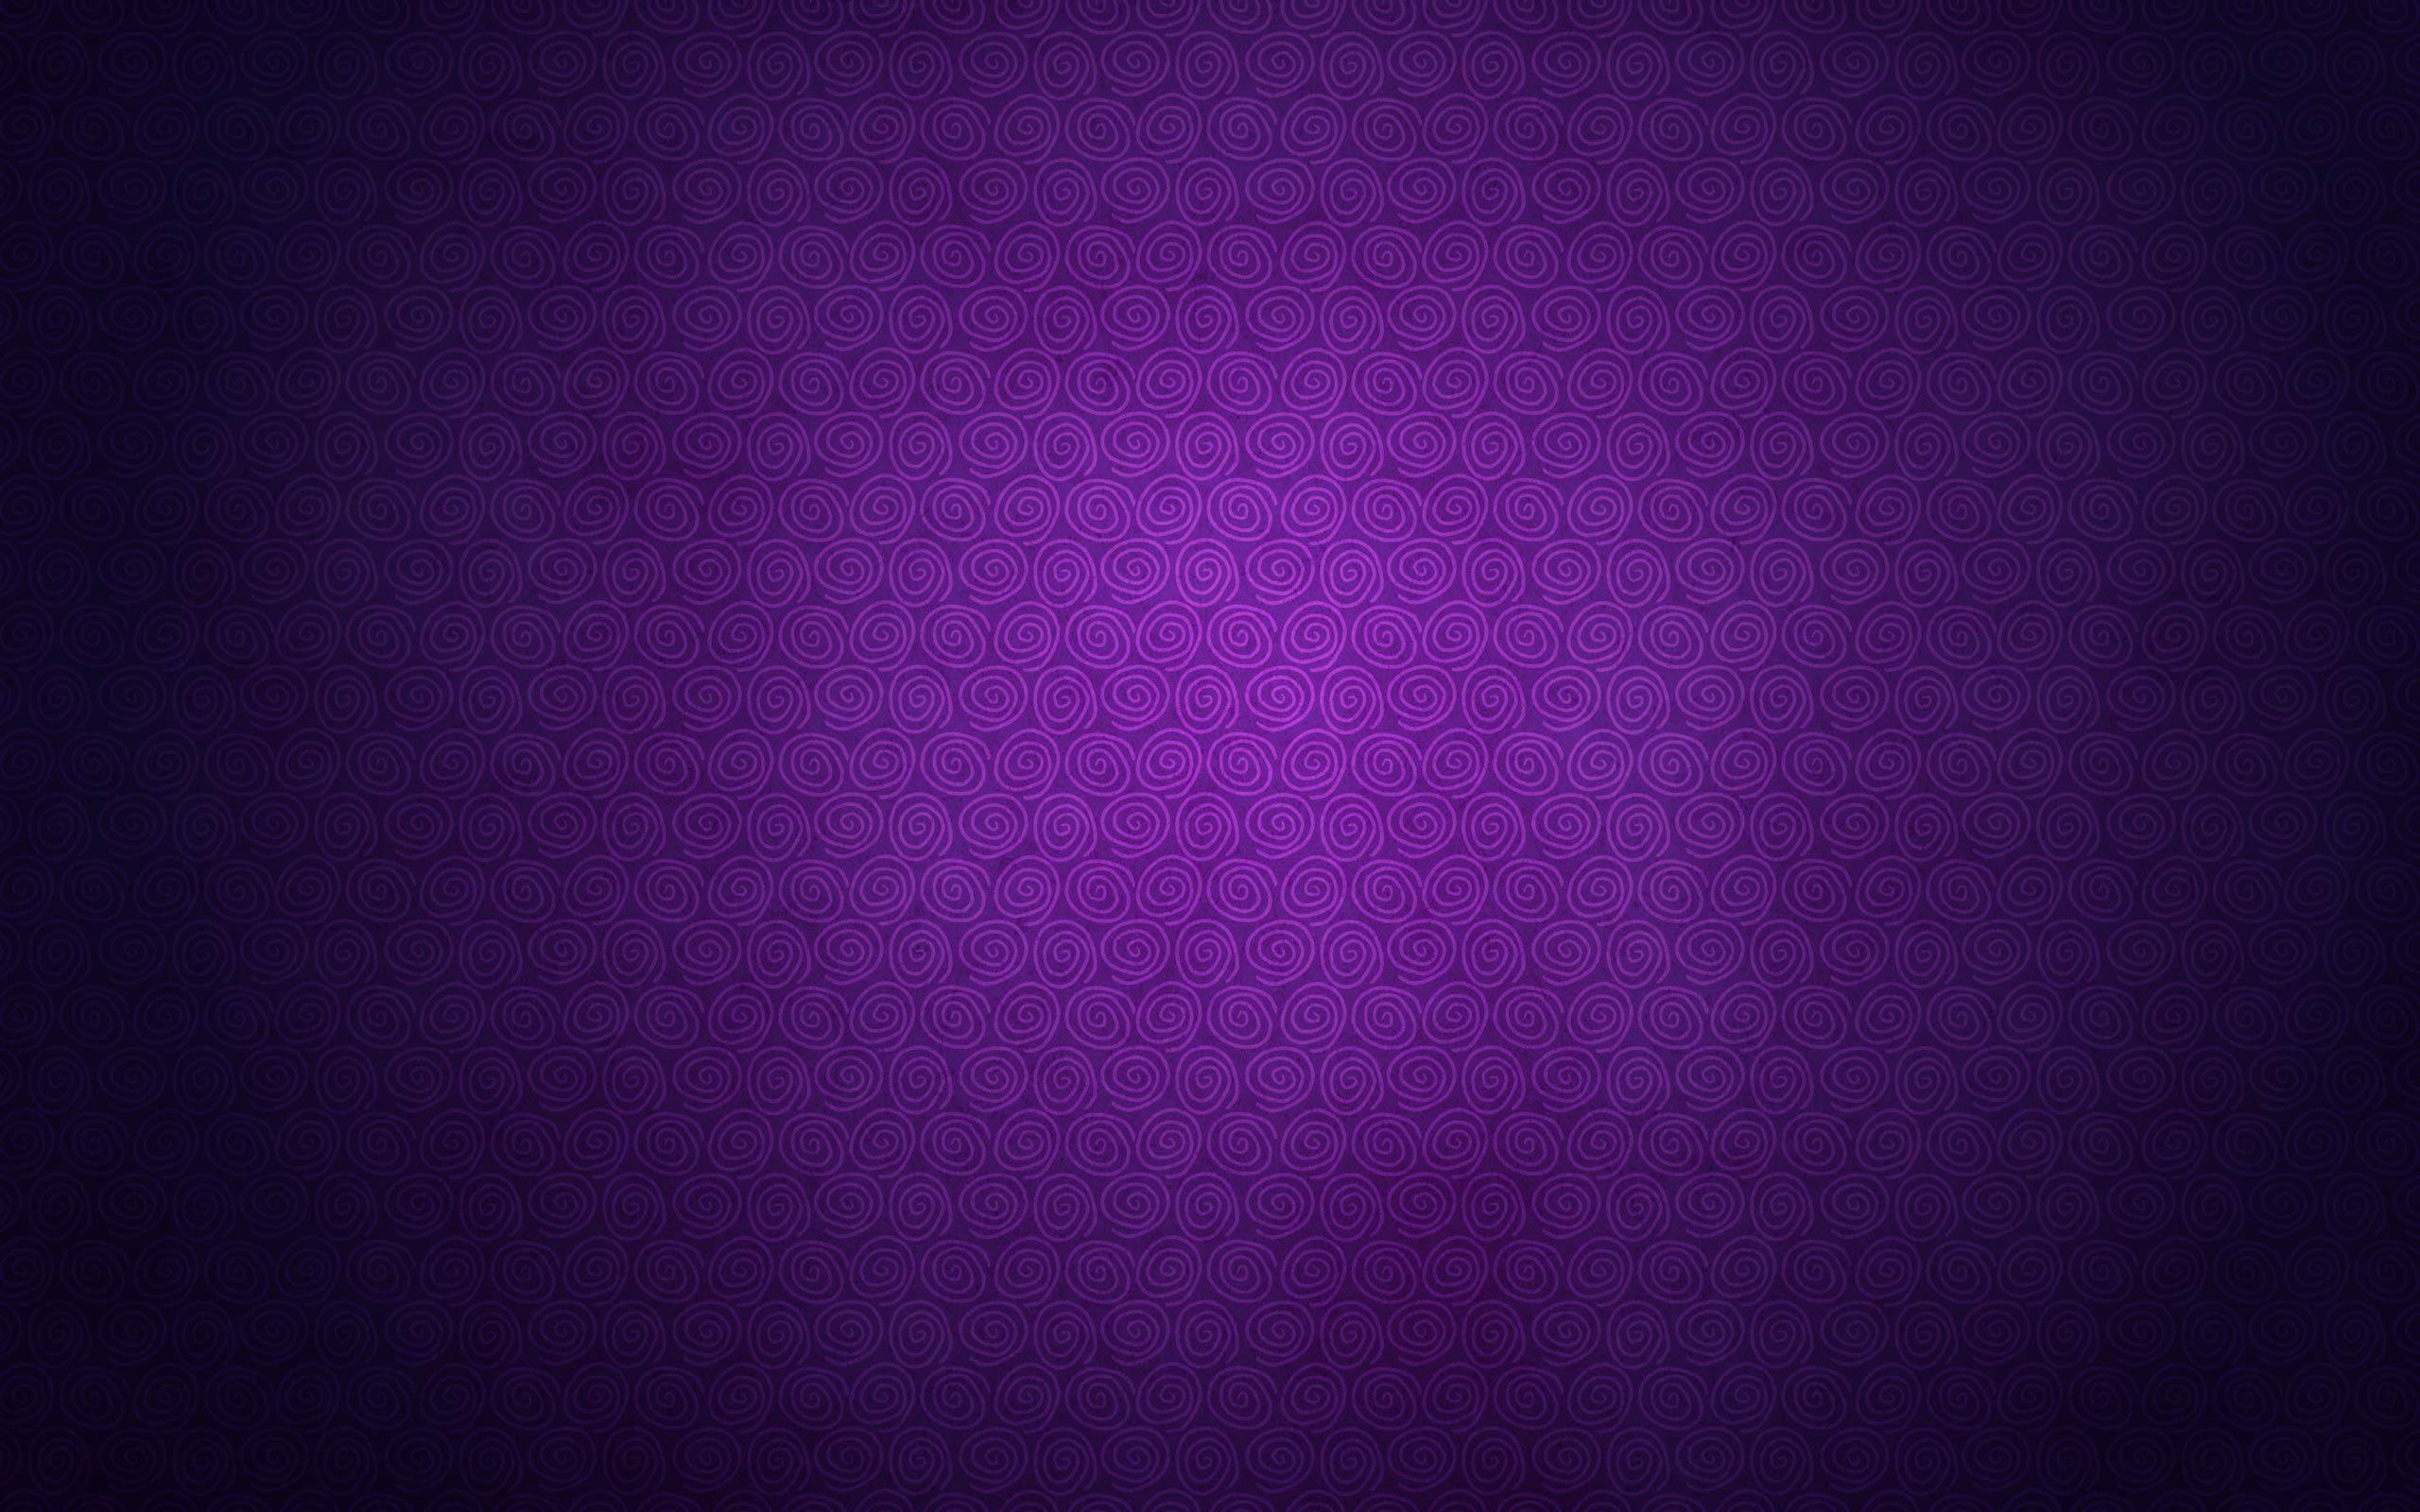 Dark Purple Wallpapers – Full HD wallpaper search